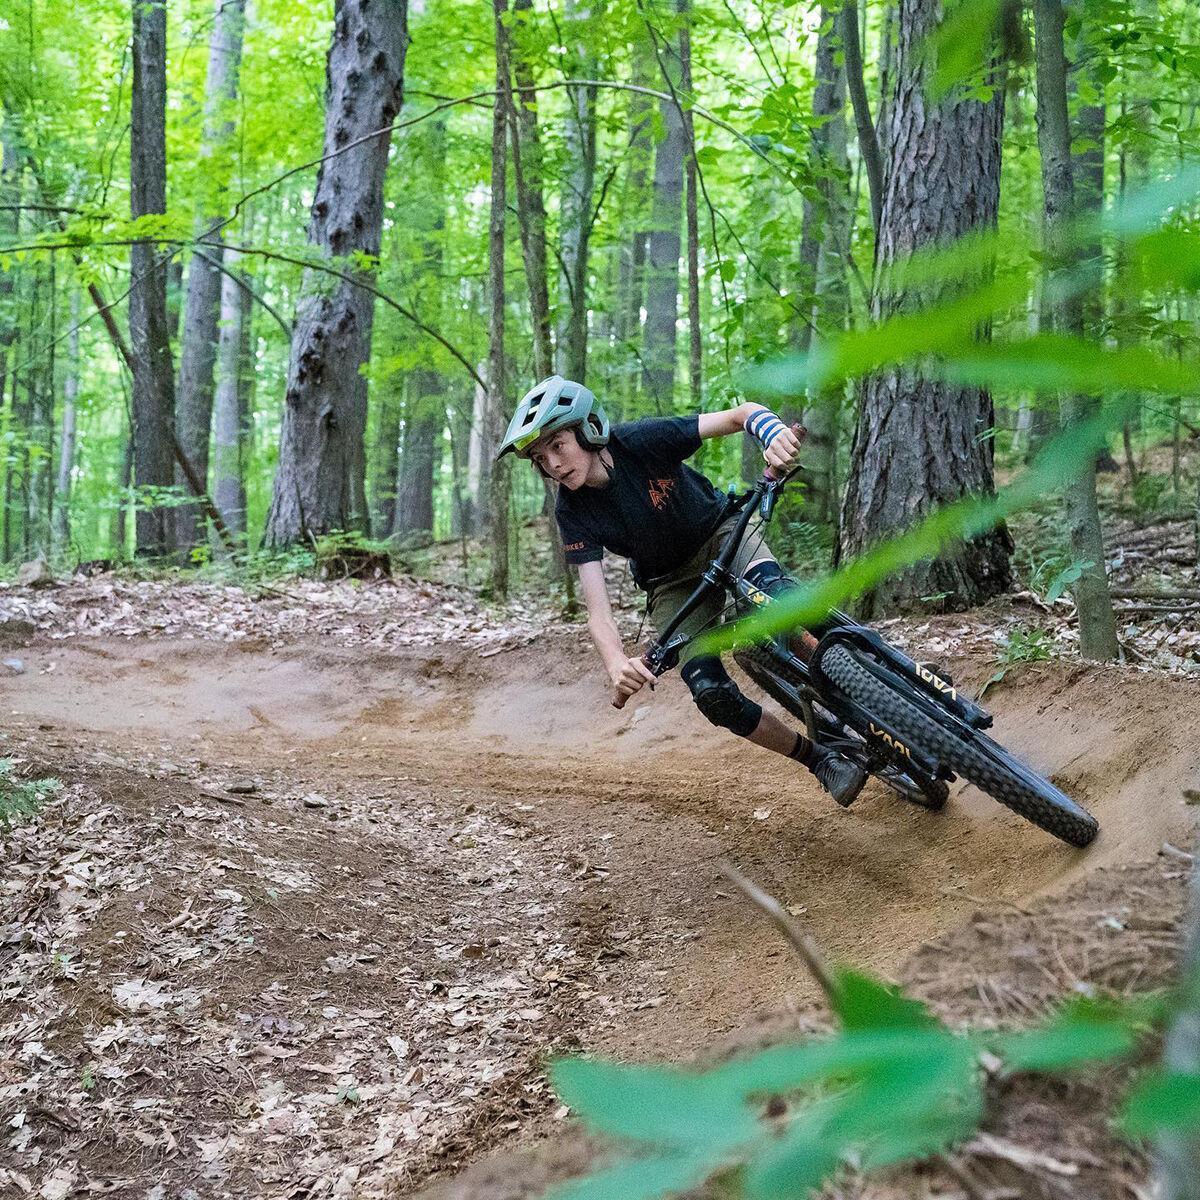 Stowe Mountain Bike Academy